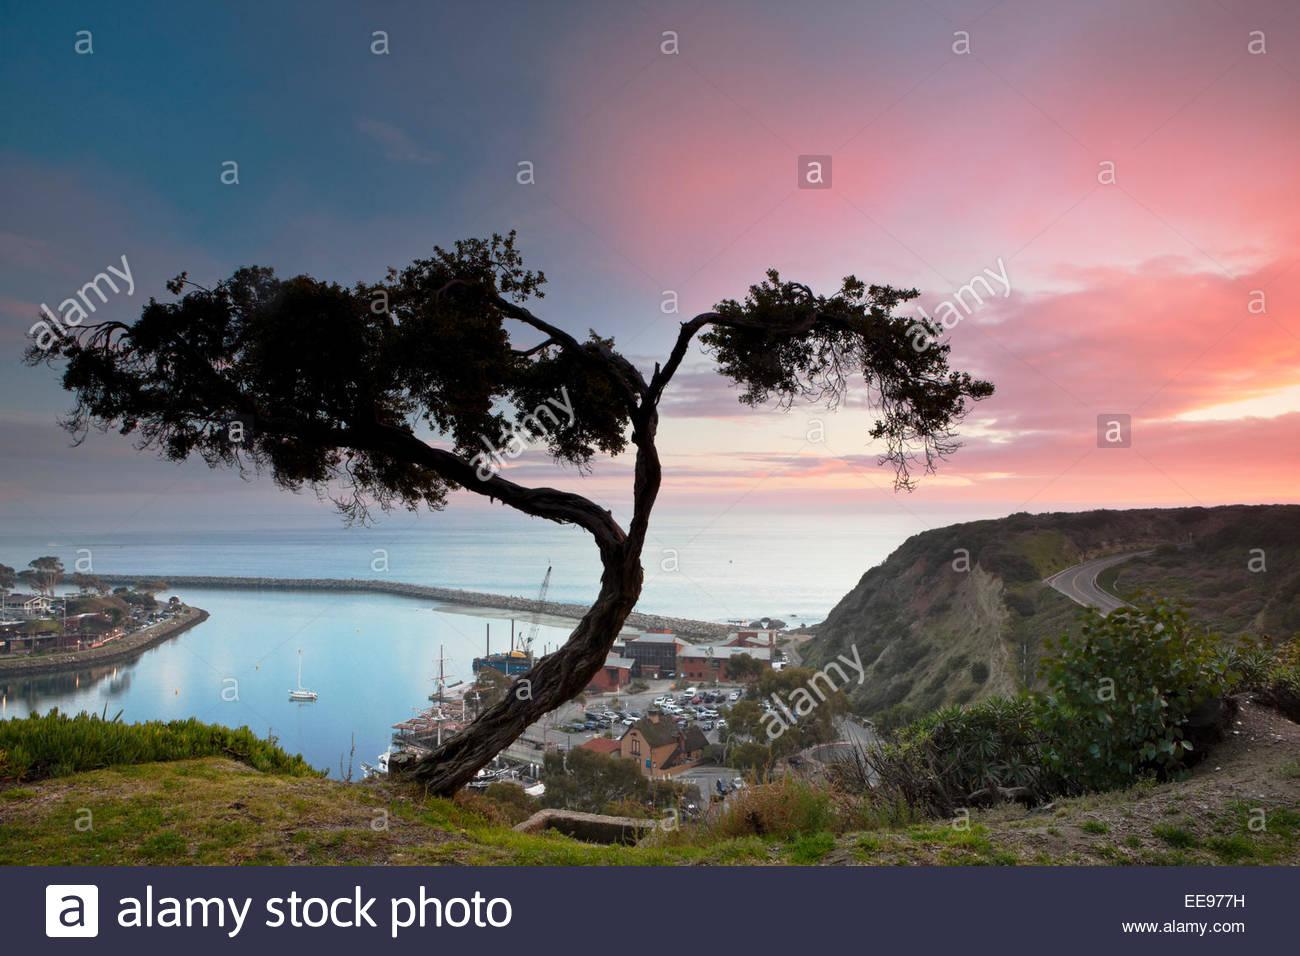 Dana Point Harbor Sunset, Dana Point, California - Stock Image